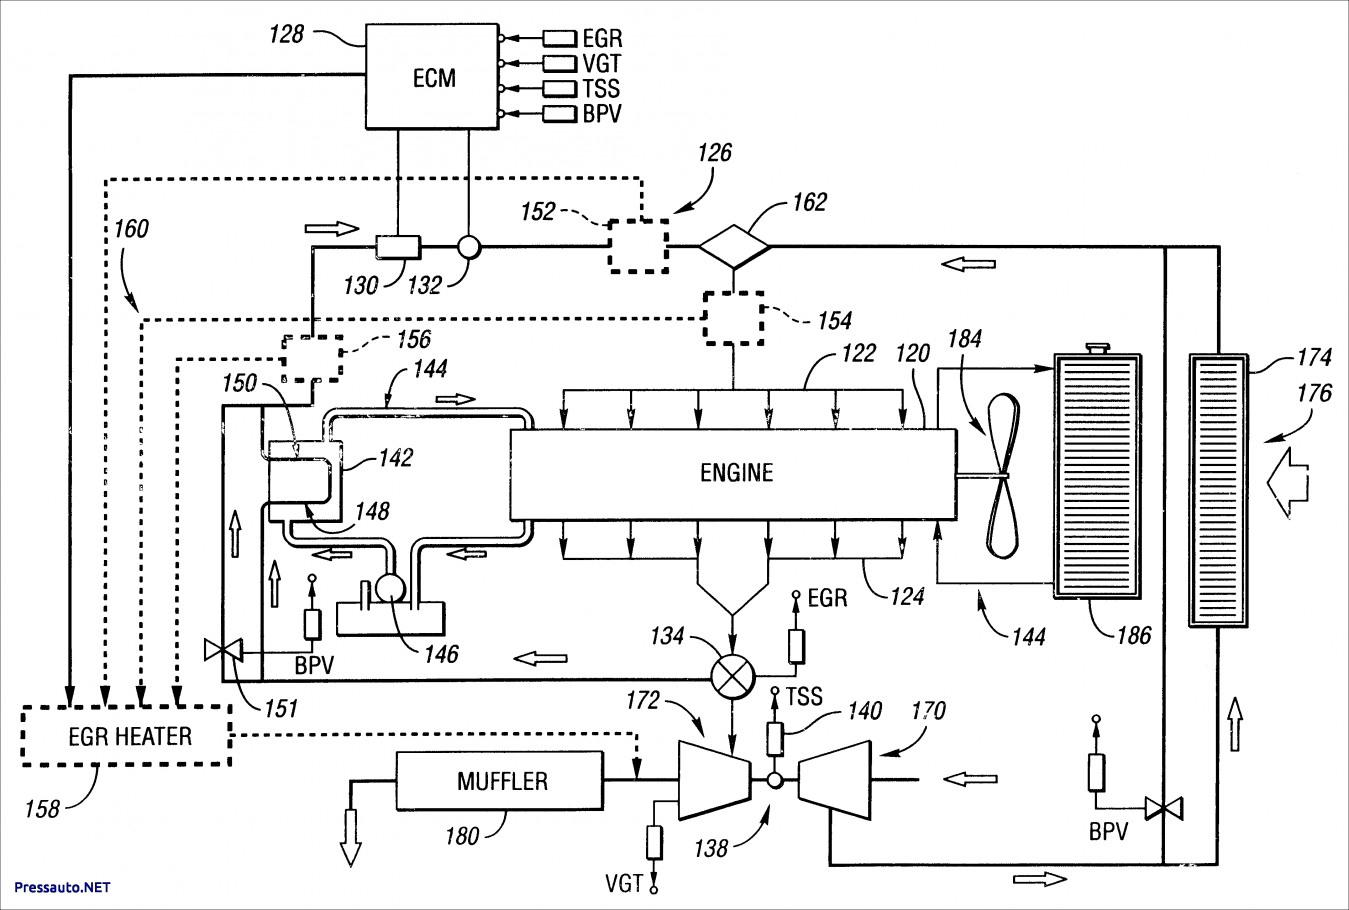 Honda Gx390 Ignition Wiring Diagram | Manual E-Books - Honda Gx390 Electric Start Wiring Diagram